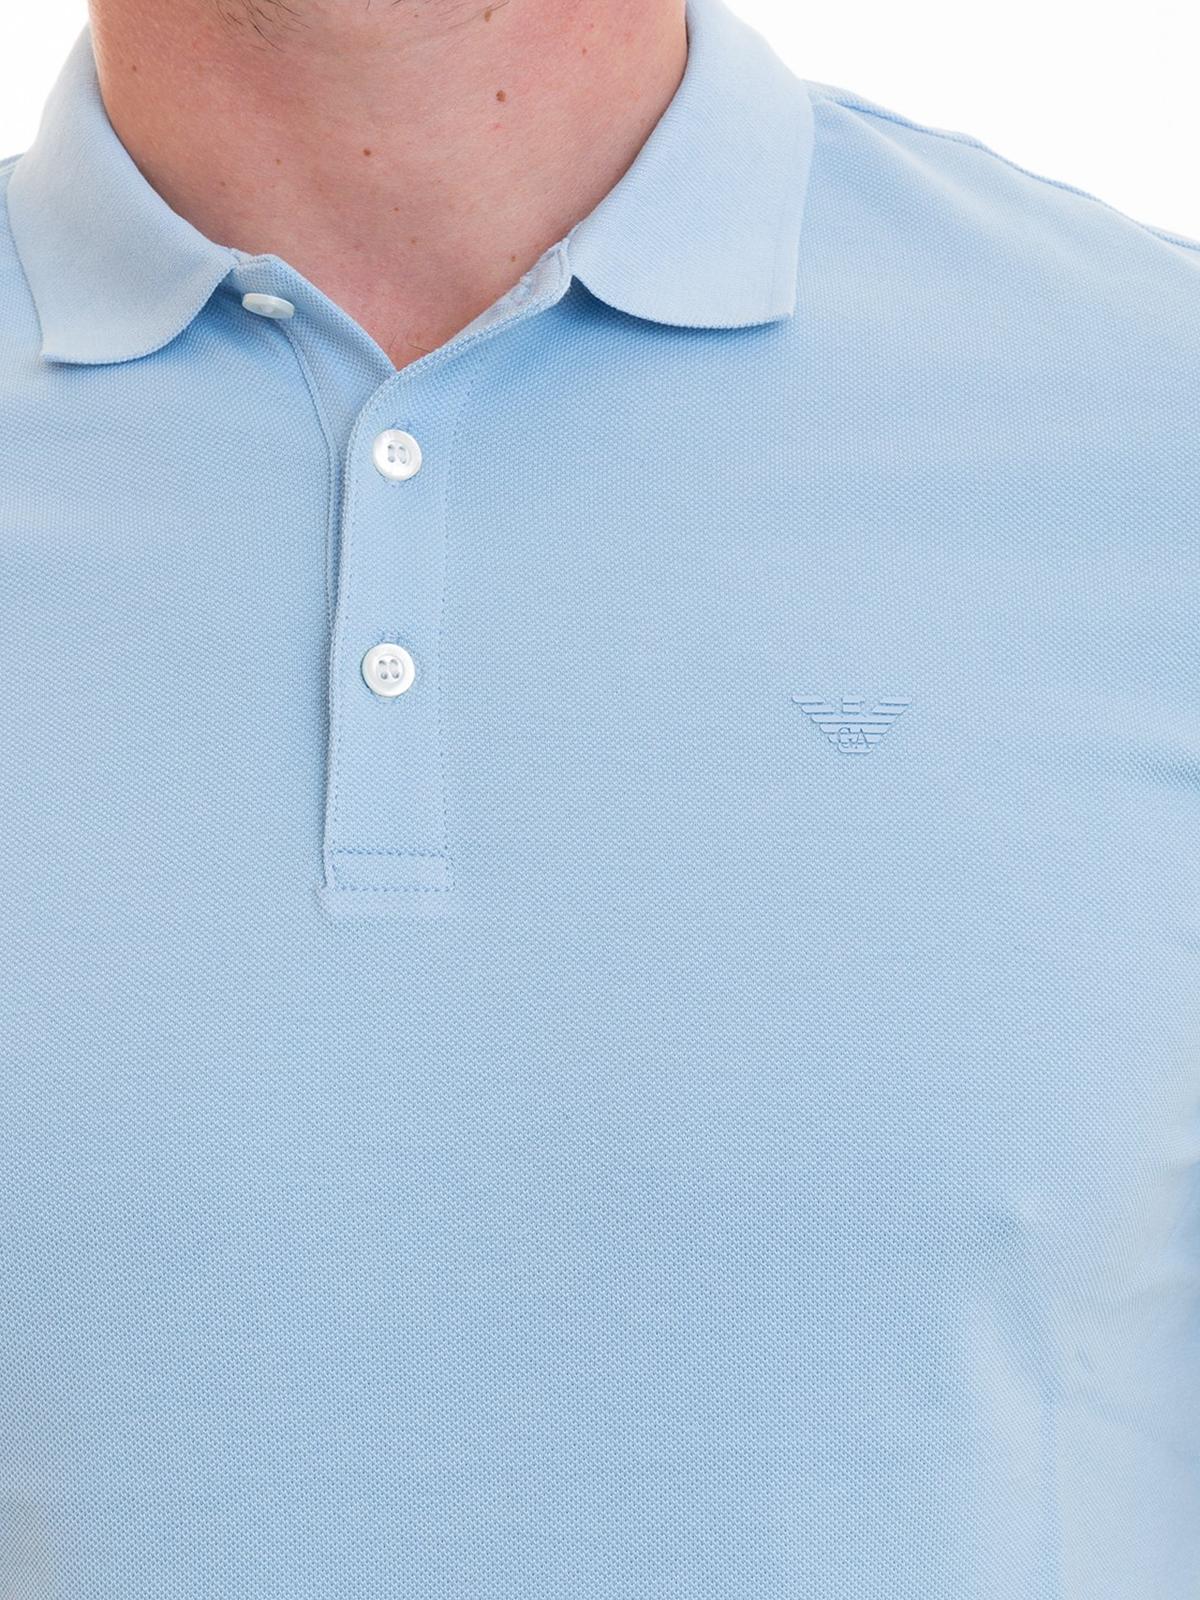 65166b8a Emporio Armani - Tonal logo light blue polo shirt - polo shirts ...